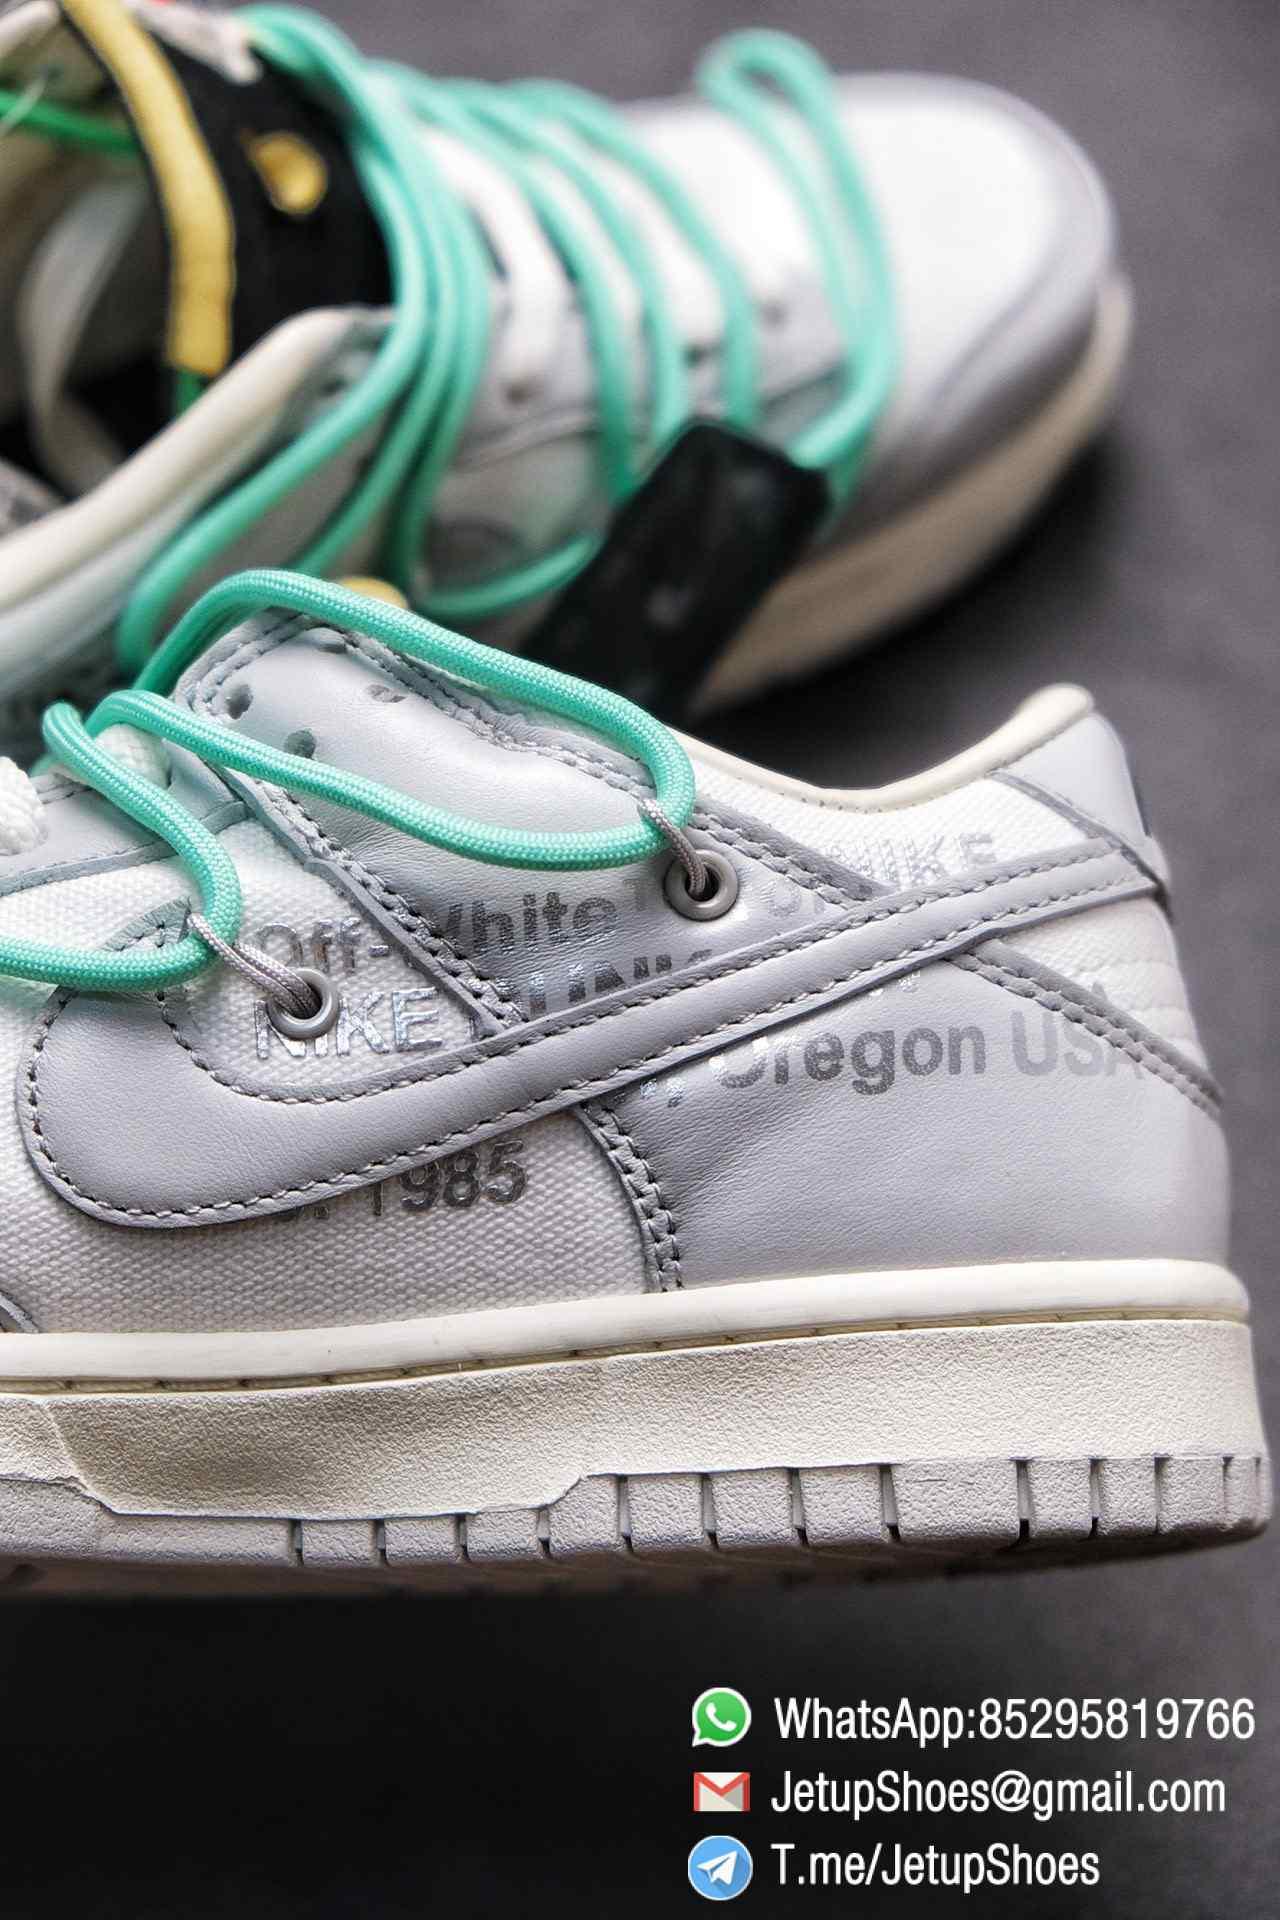 Best Replica Nike Sneakers 0ff White x Nike Dunk Low 04 of 50 SKU DM1602 114 Top RepSneakers Supplier 08